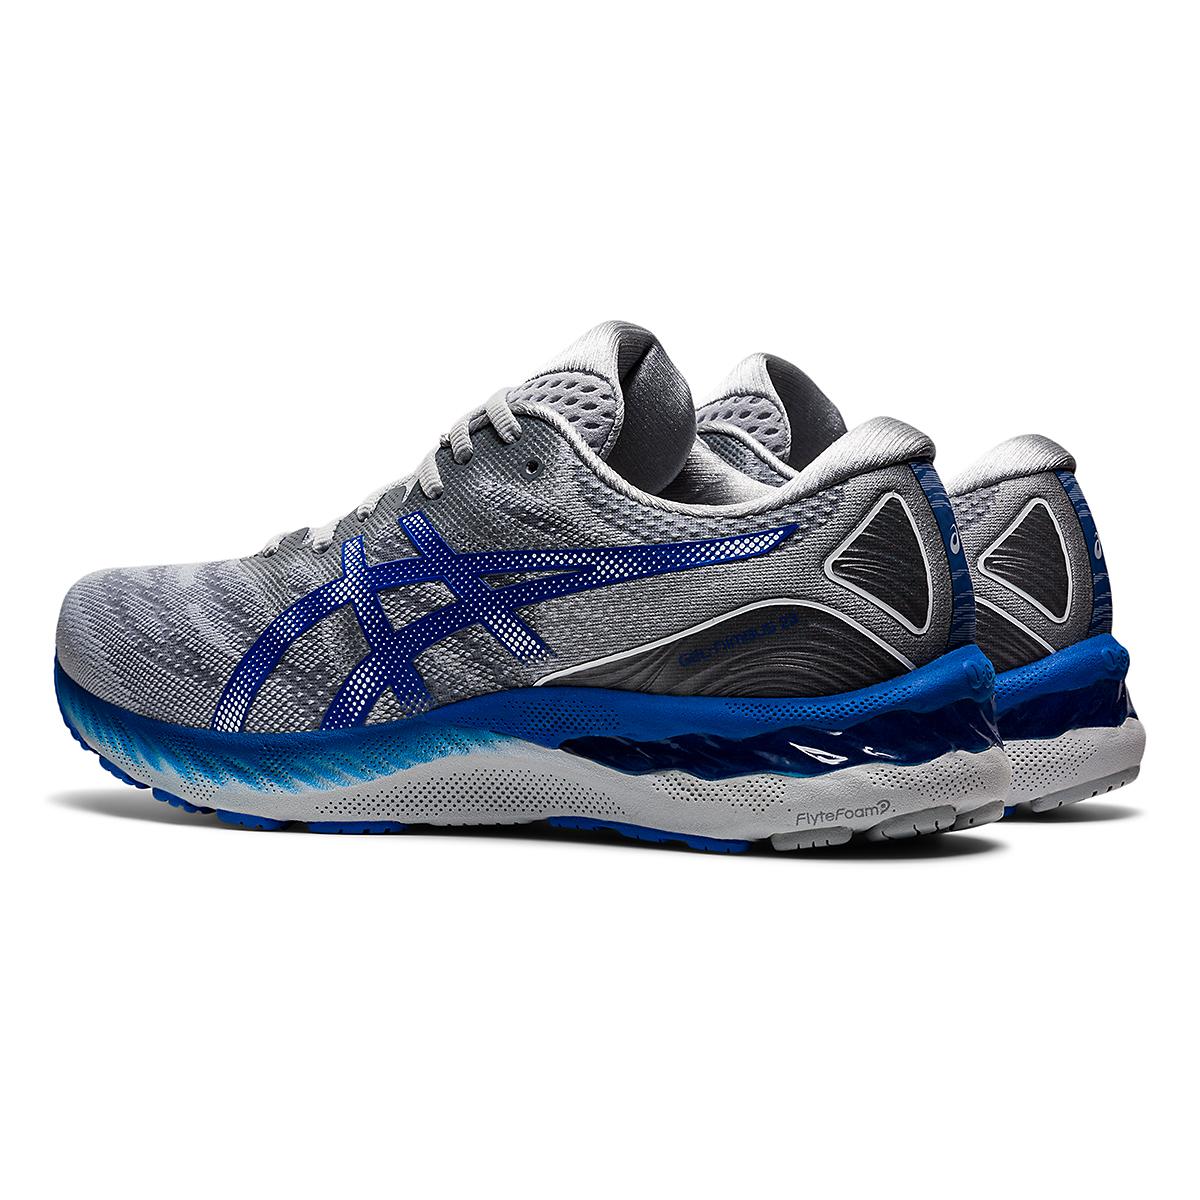 Men's Asics Gel-Nimbus 23 Running Shoe - Color: Piedmont Grey - Size: 6 - Width: Regular, Piedmont Grey, large, image 4